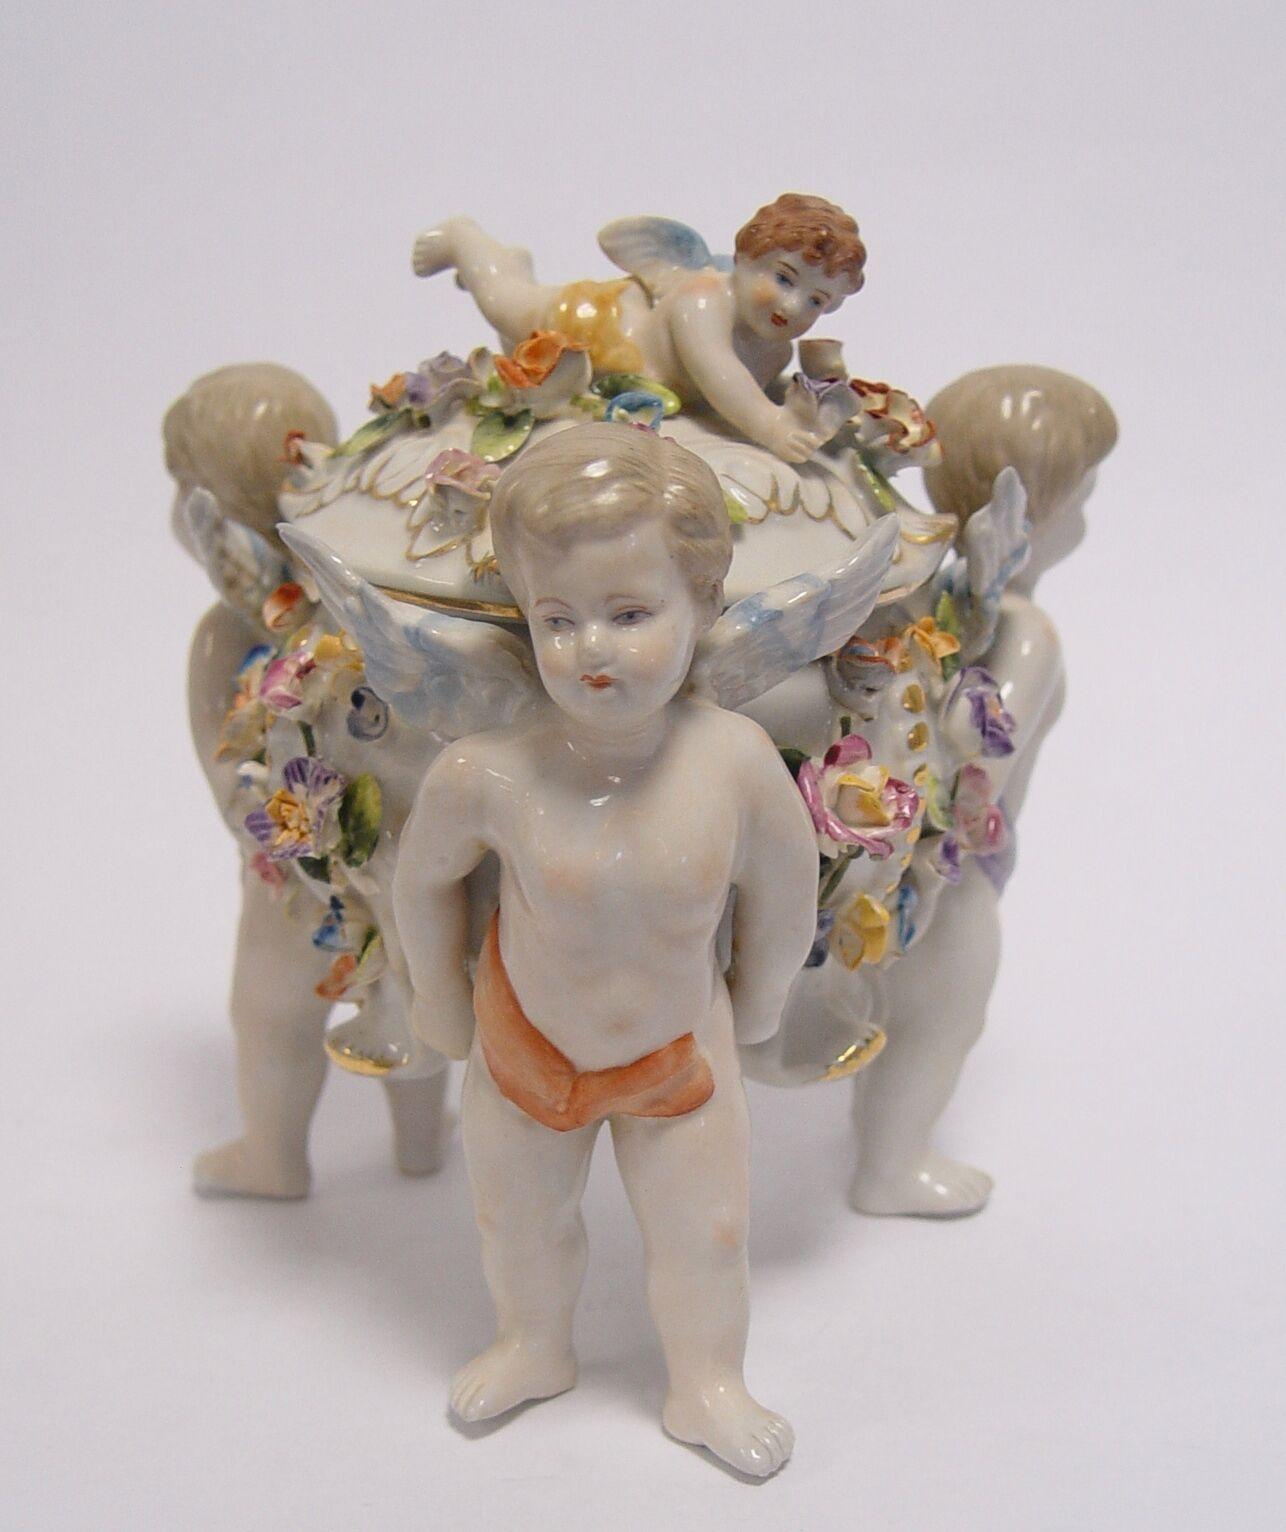 Porcelana tapa cáscara cáscara con tapa lata figuras grupo ángel personaje Ángel